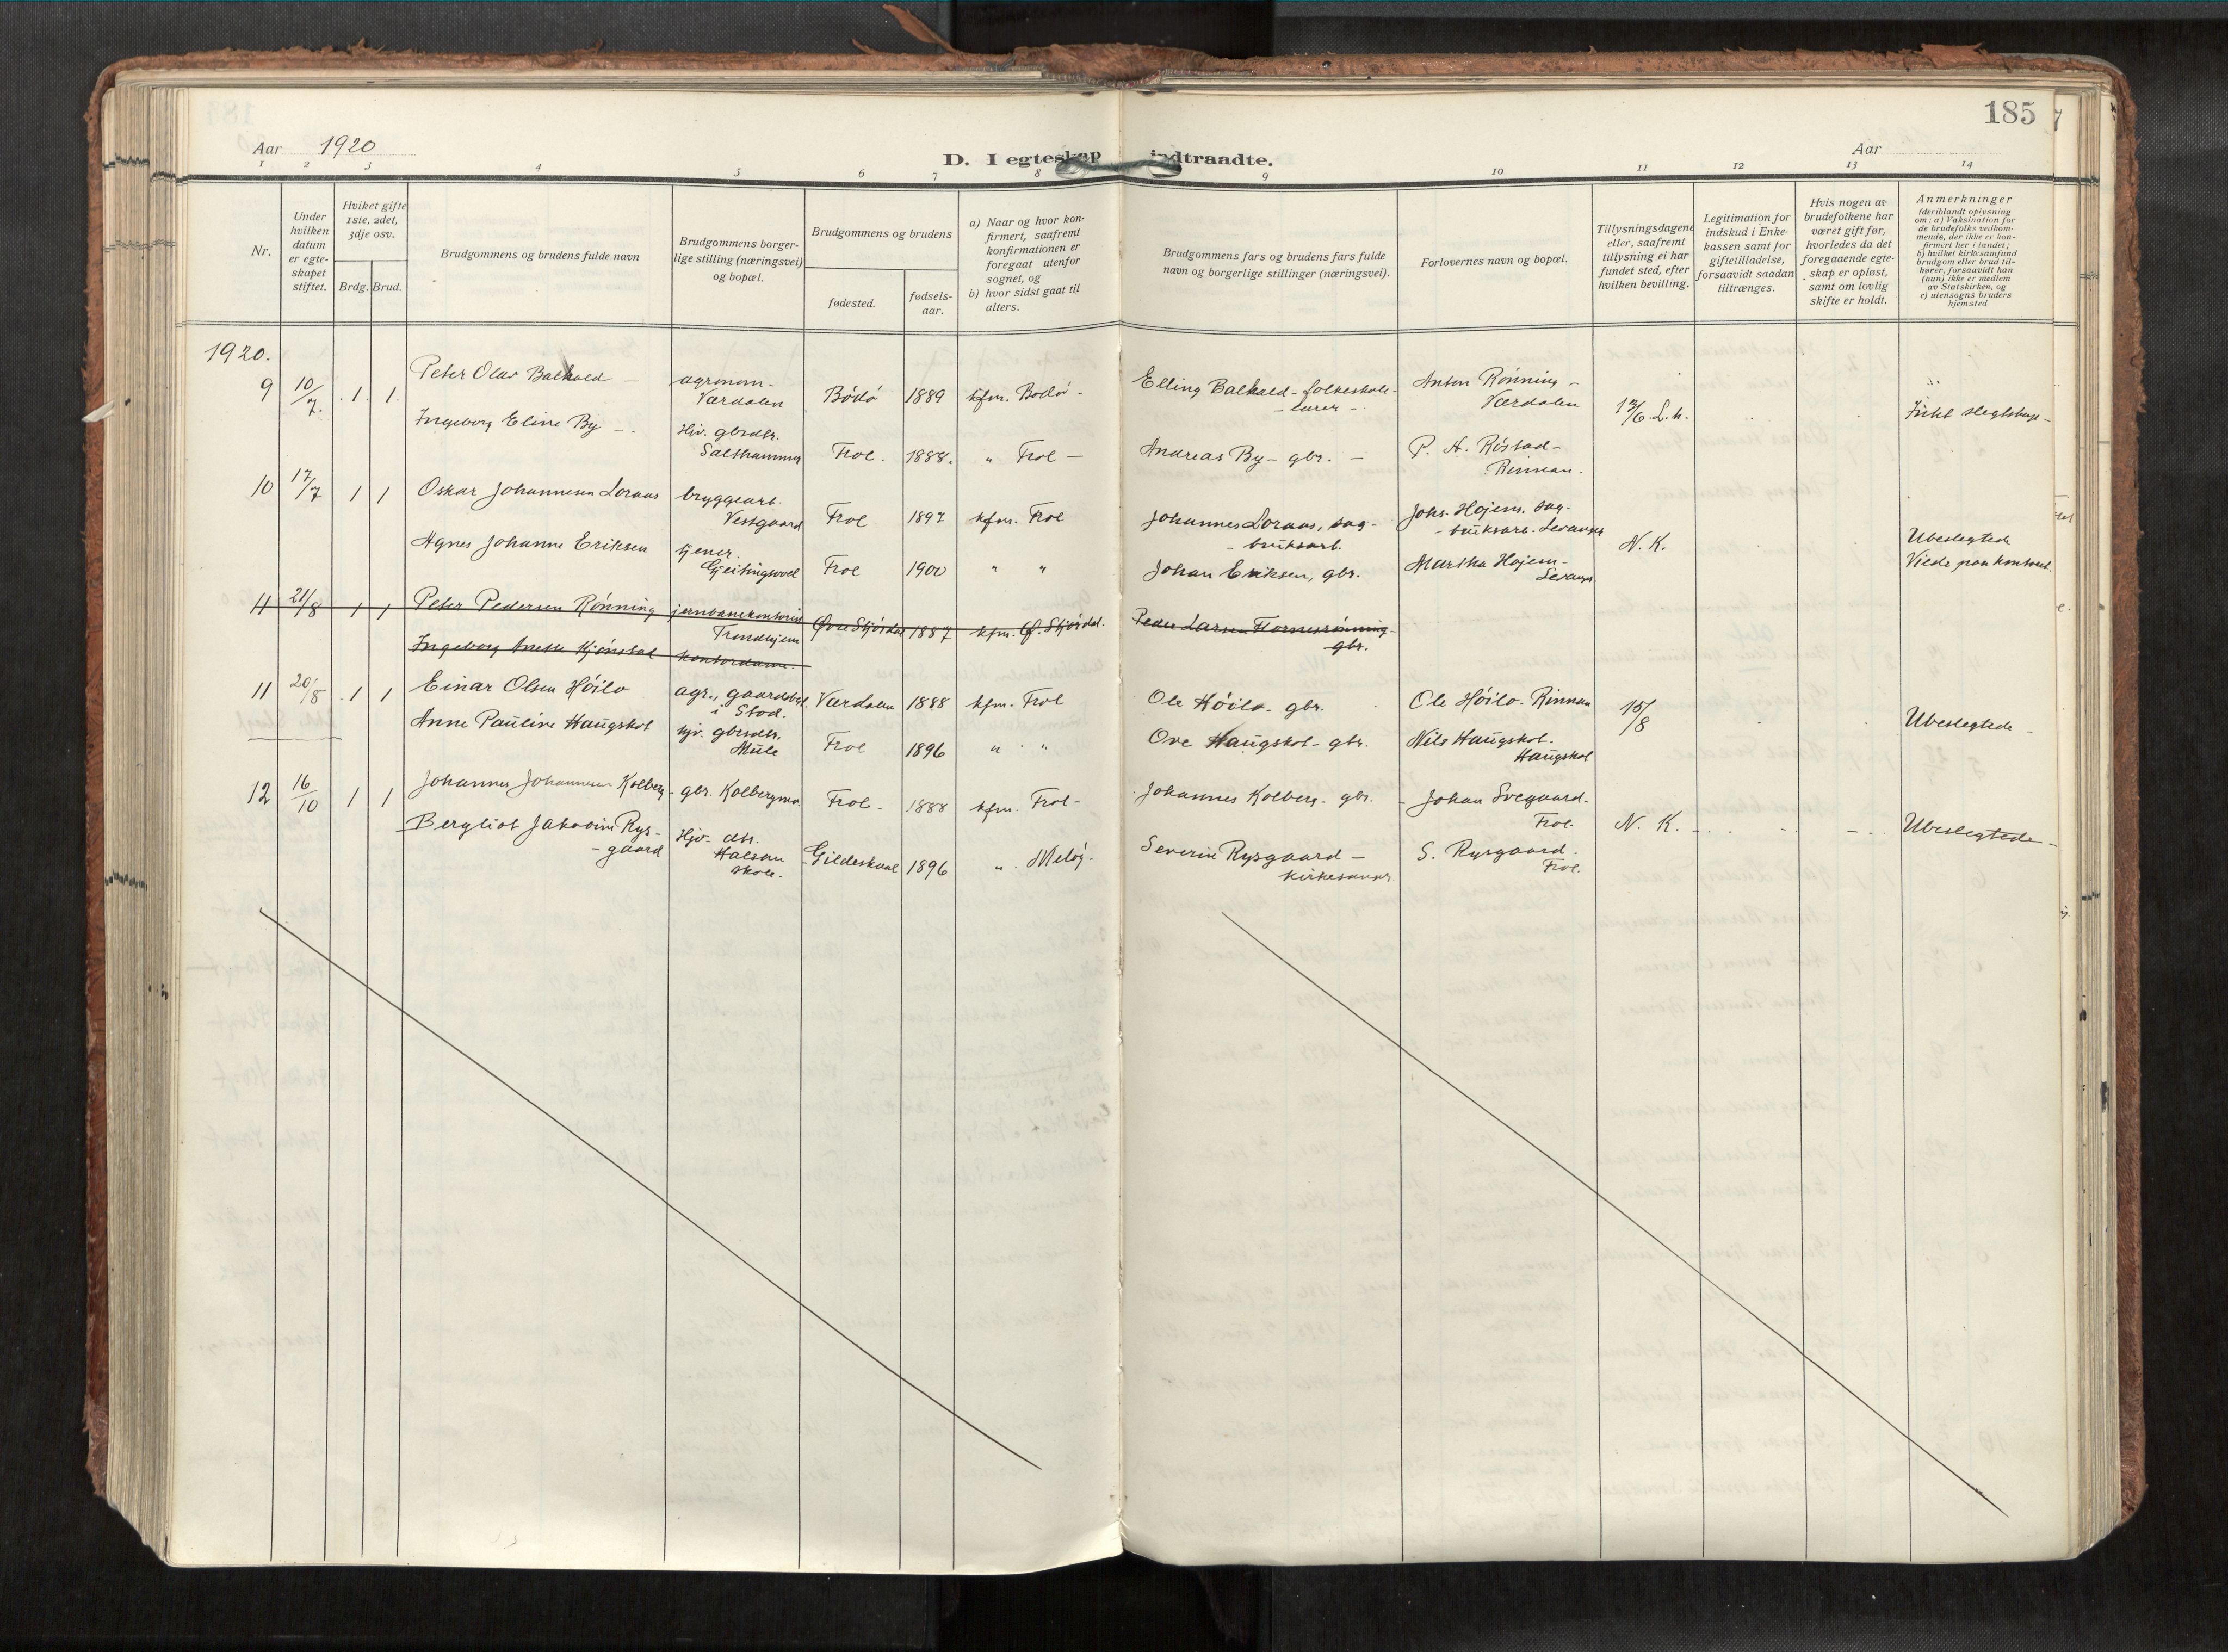 SAT, Levanger sokneprestkontor*, Parish register (official) no. 1, 1912-1935, p. 185